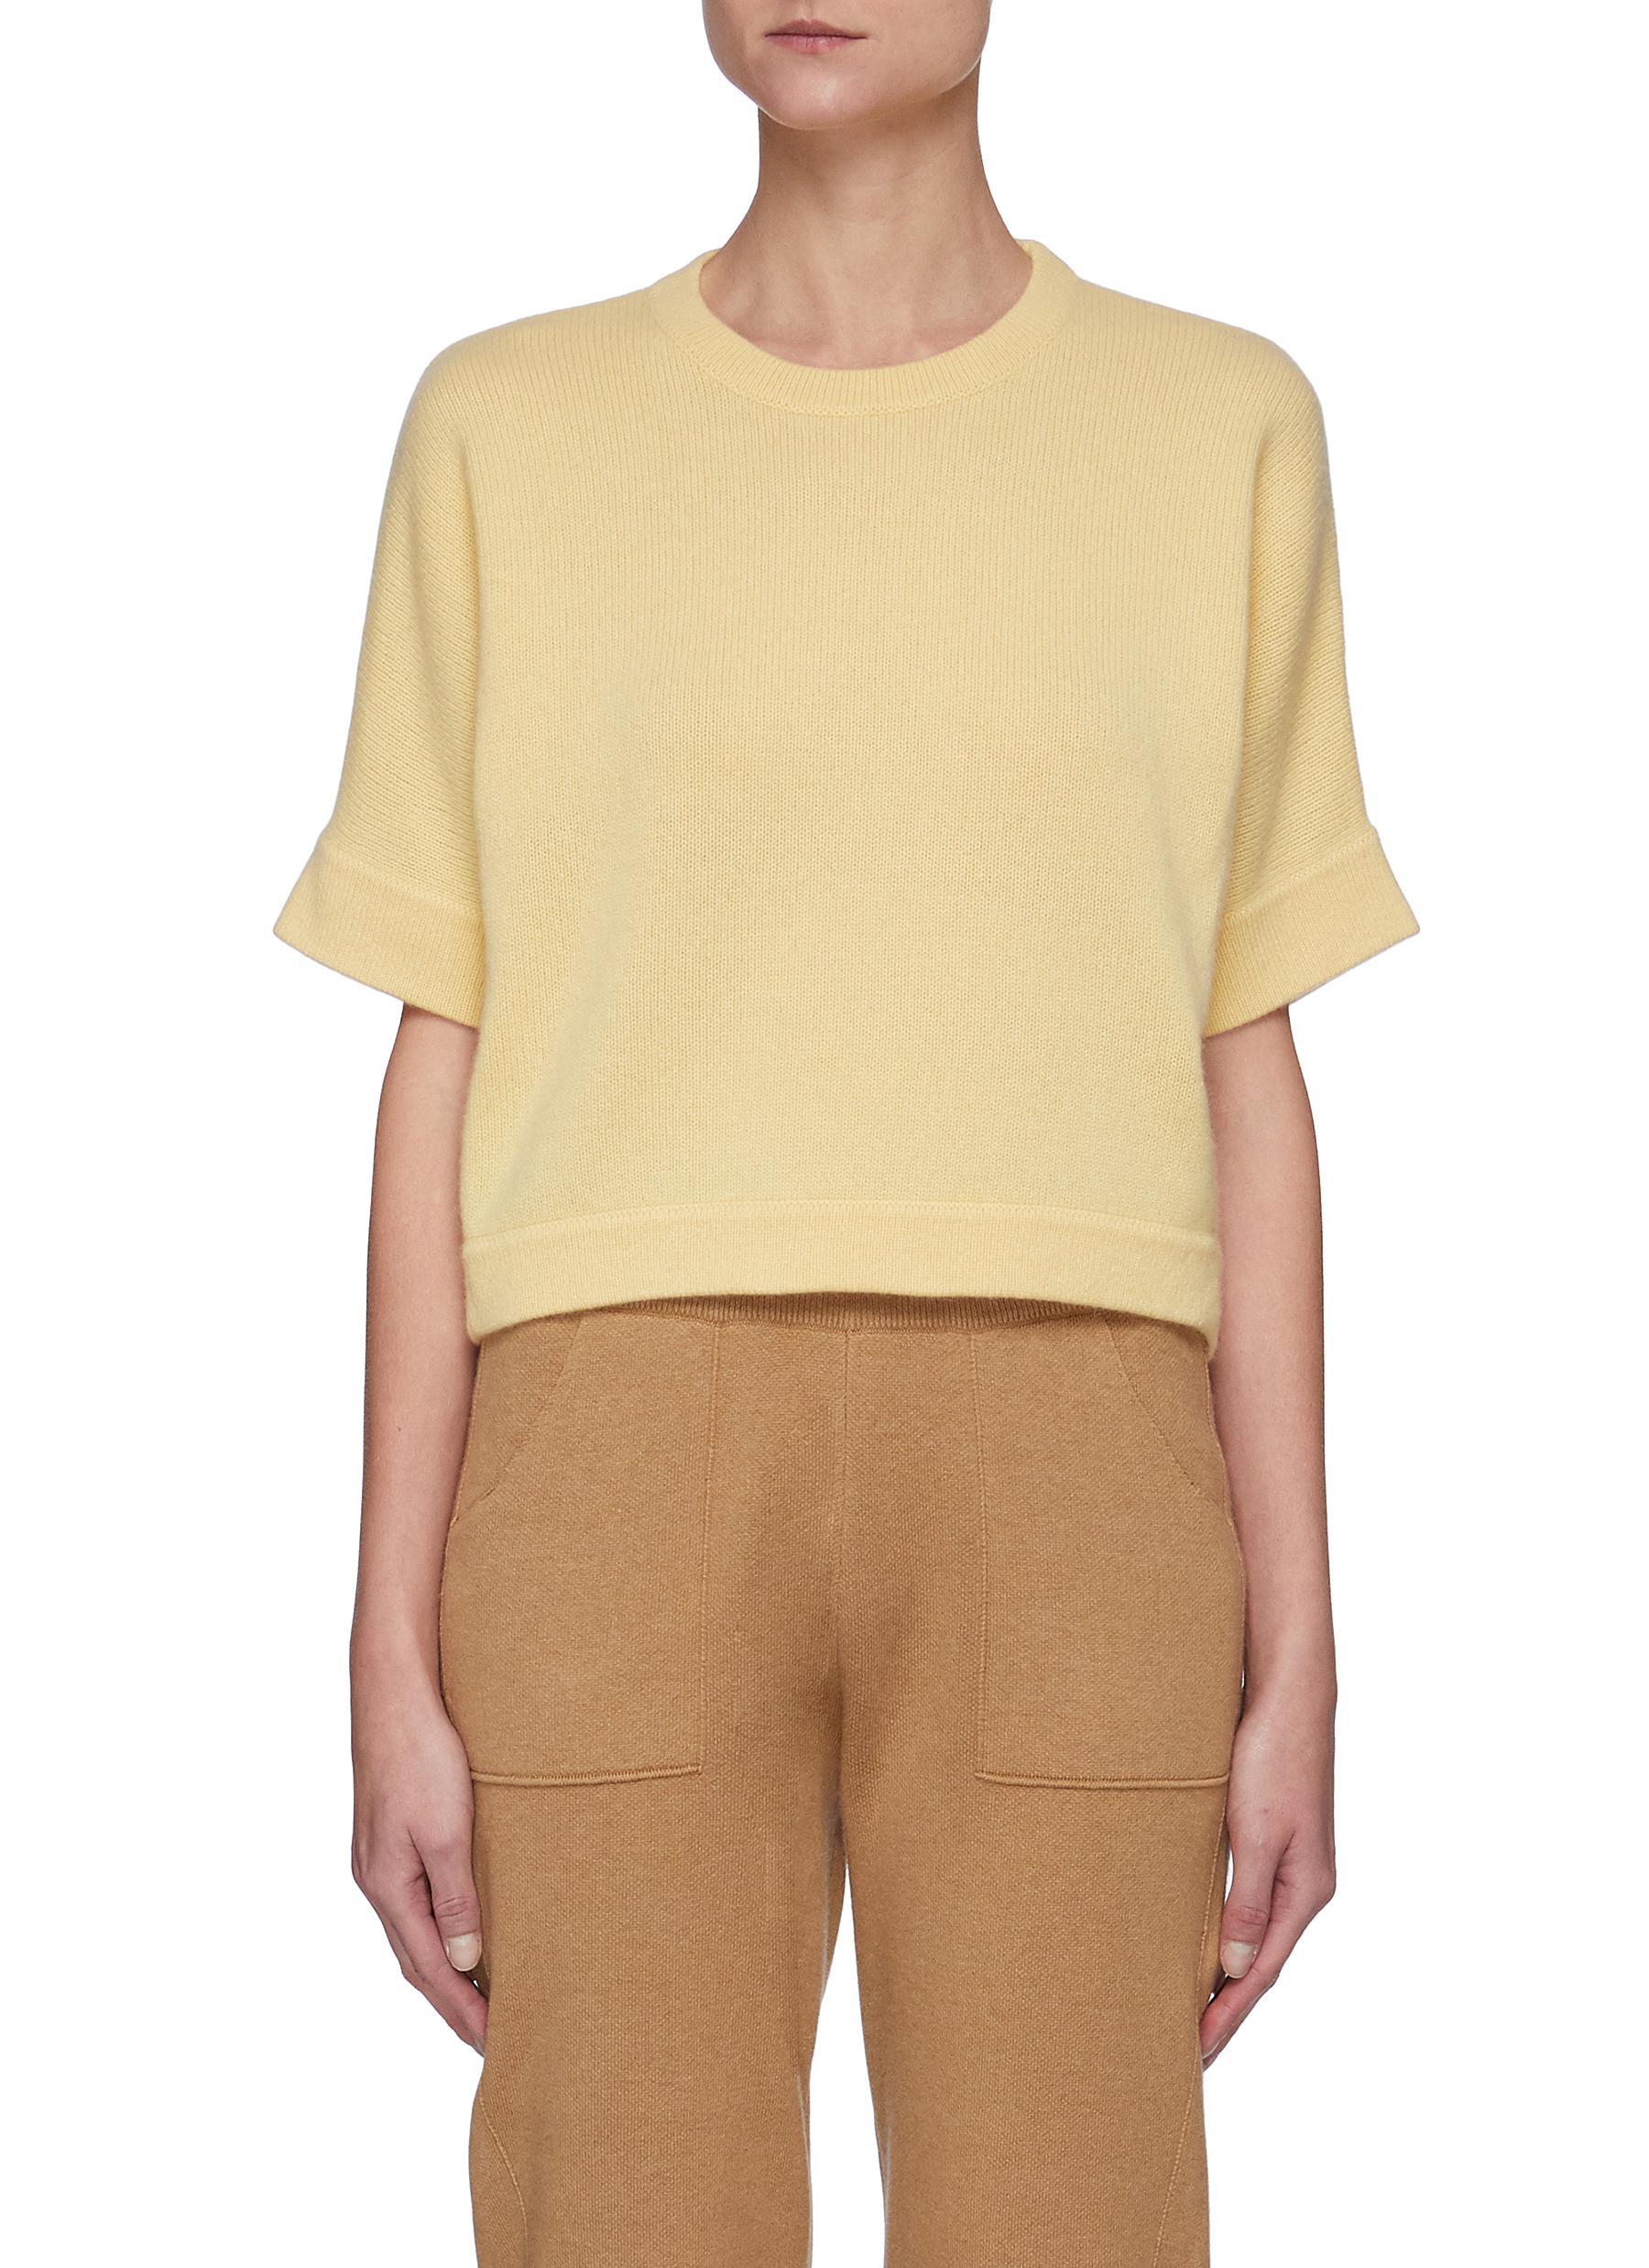 Cashmere Raglan Short Sleeve Crewneck Sweater